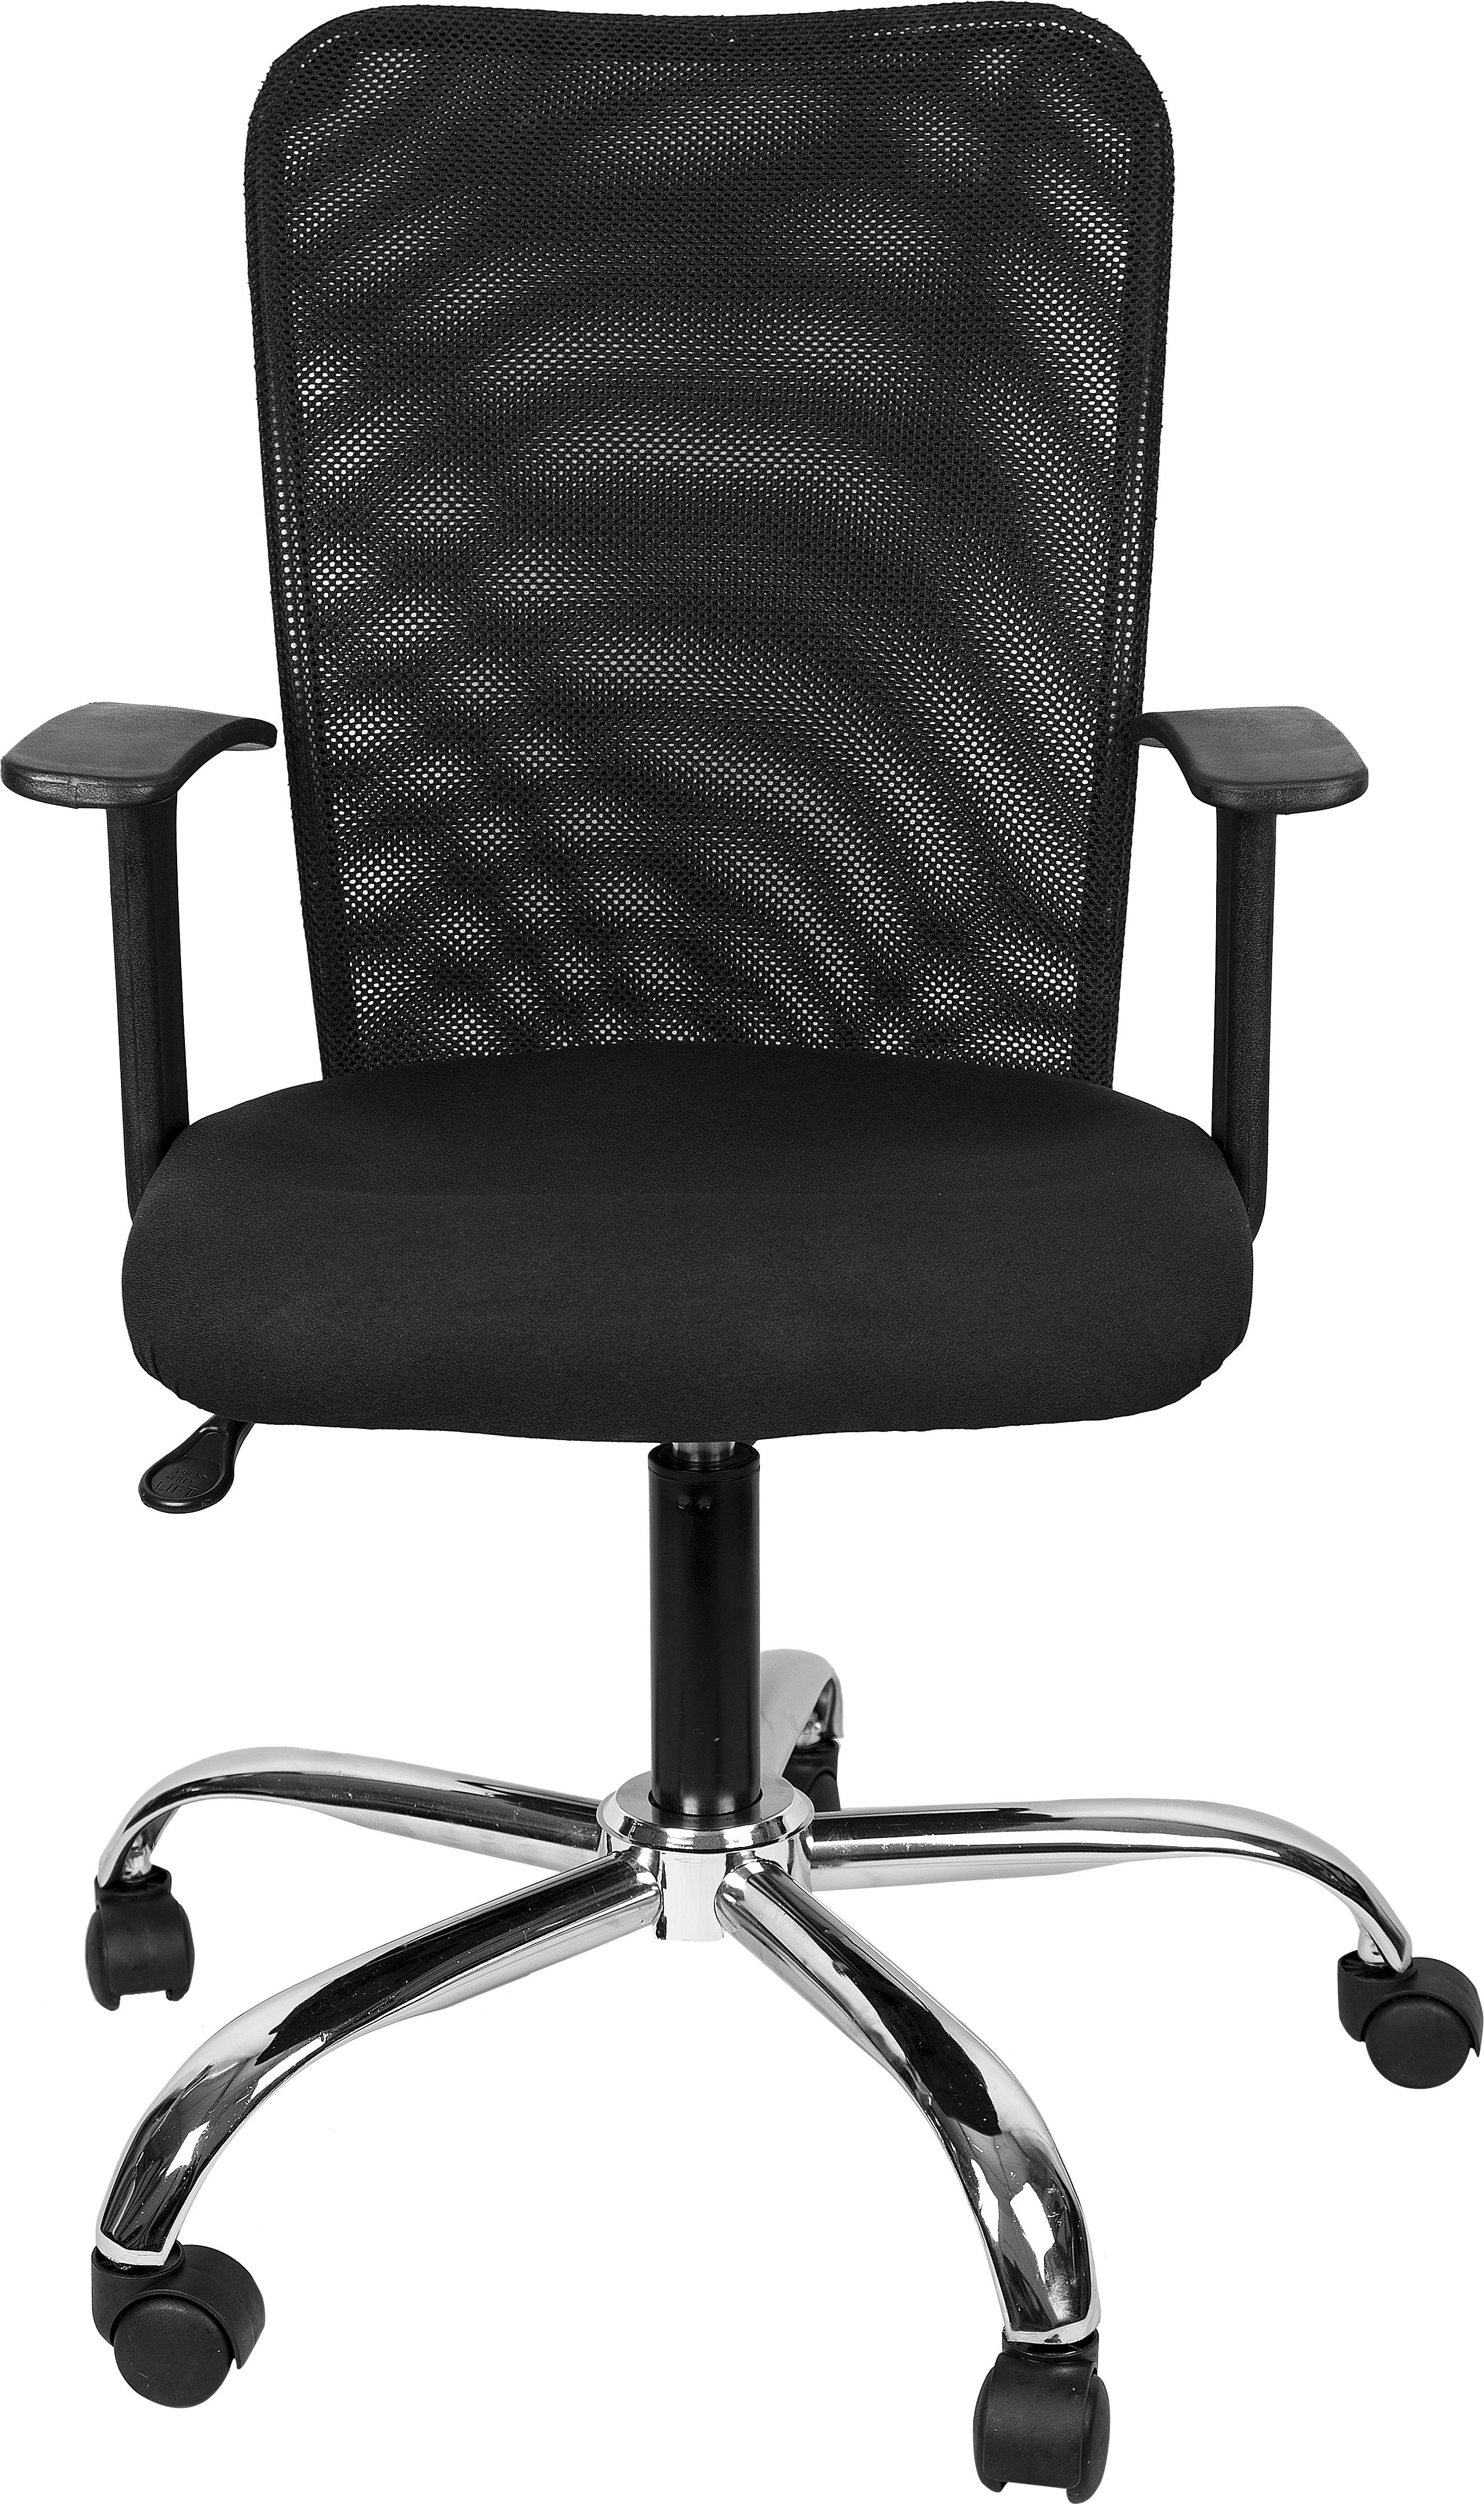 View Hetal Enterprises Fabric Office Chair(Black) Furniture (Hetal Enterprises)